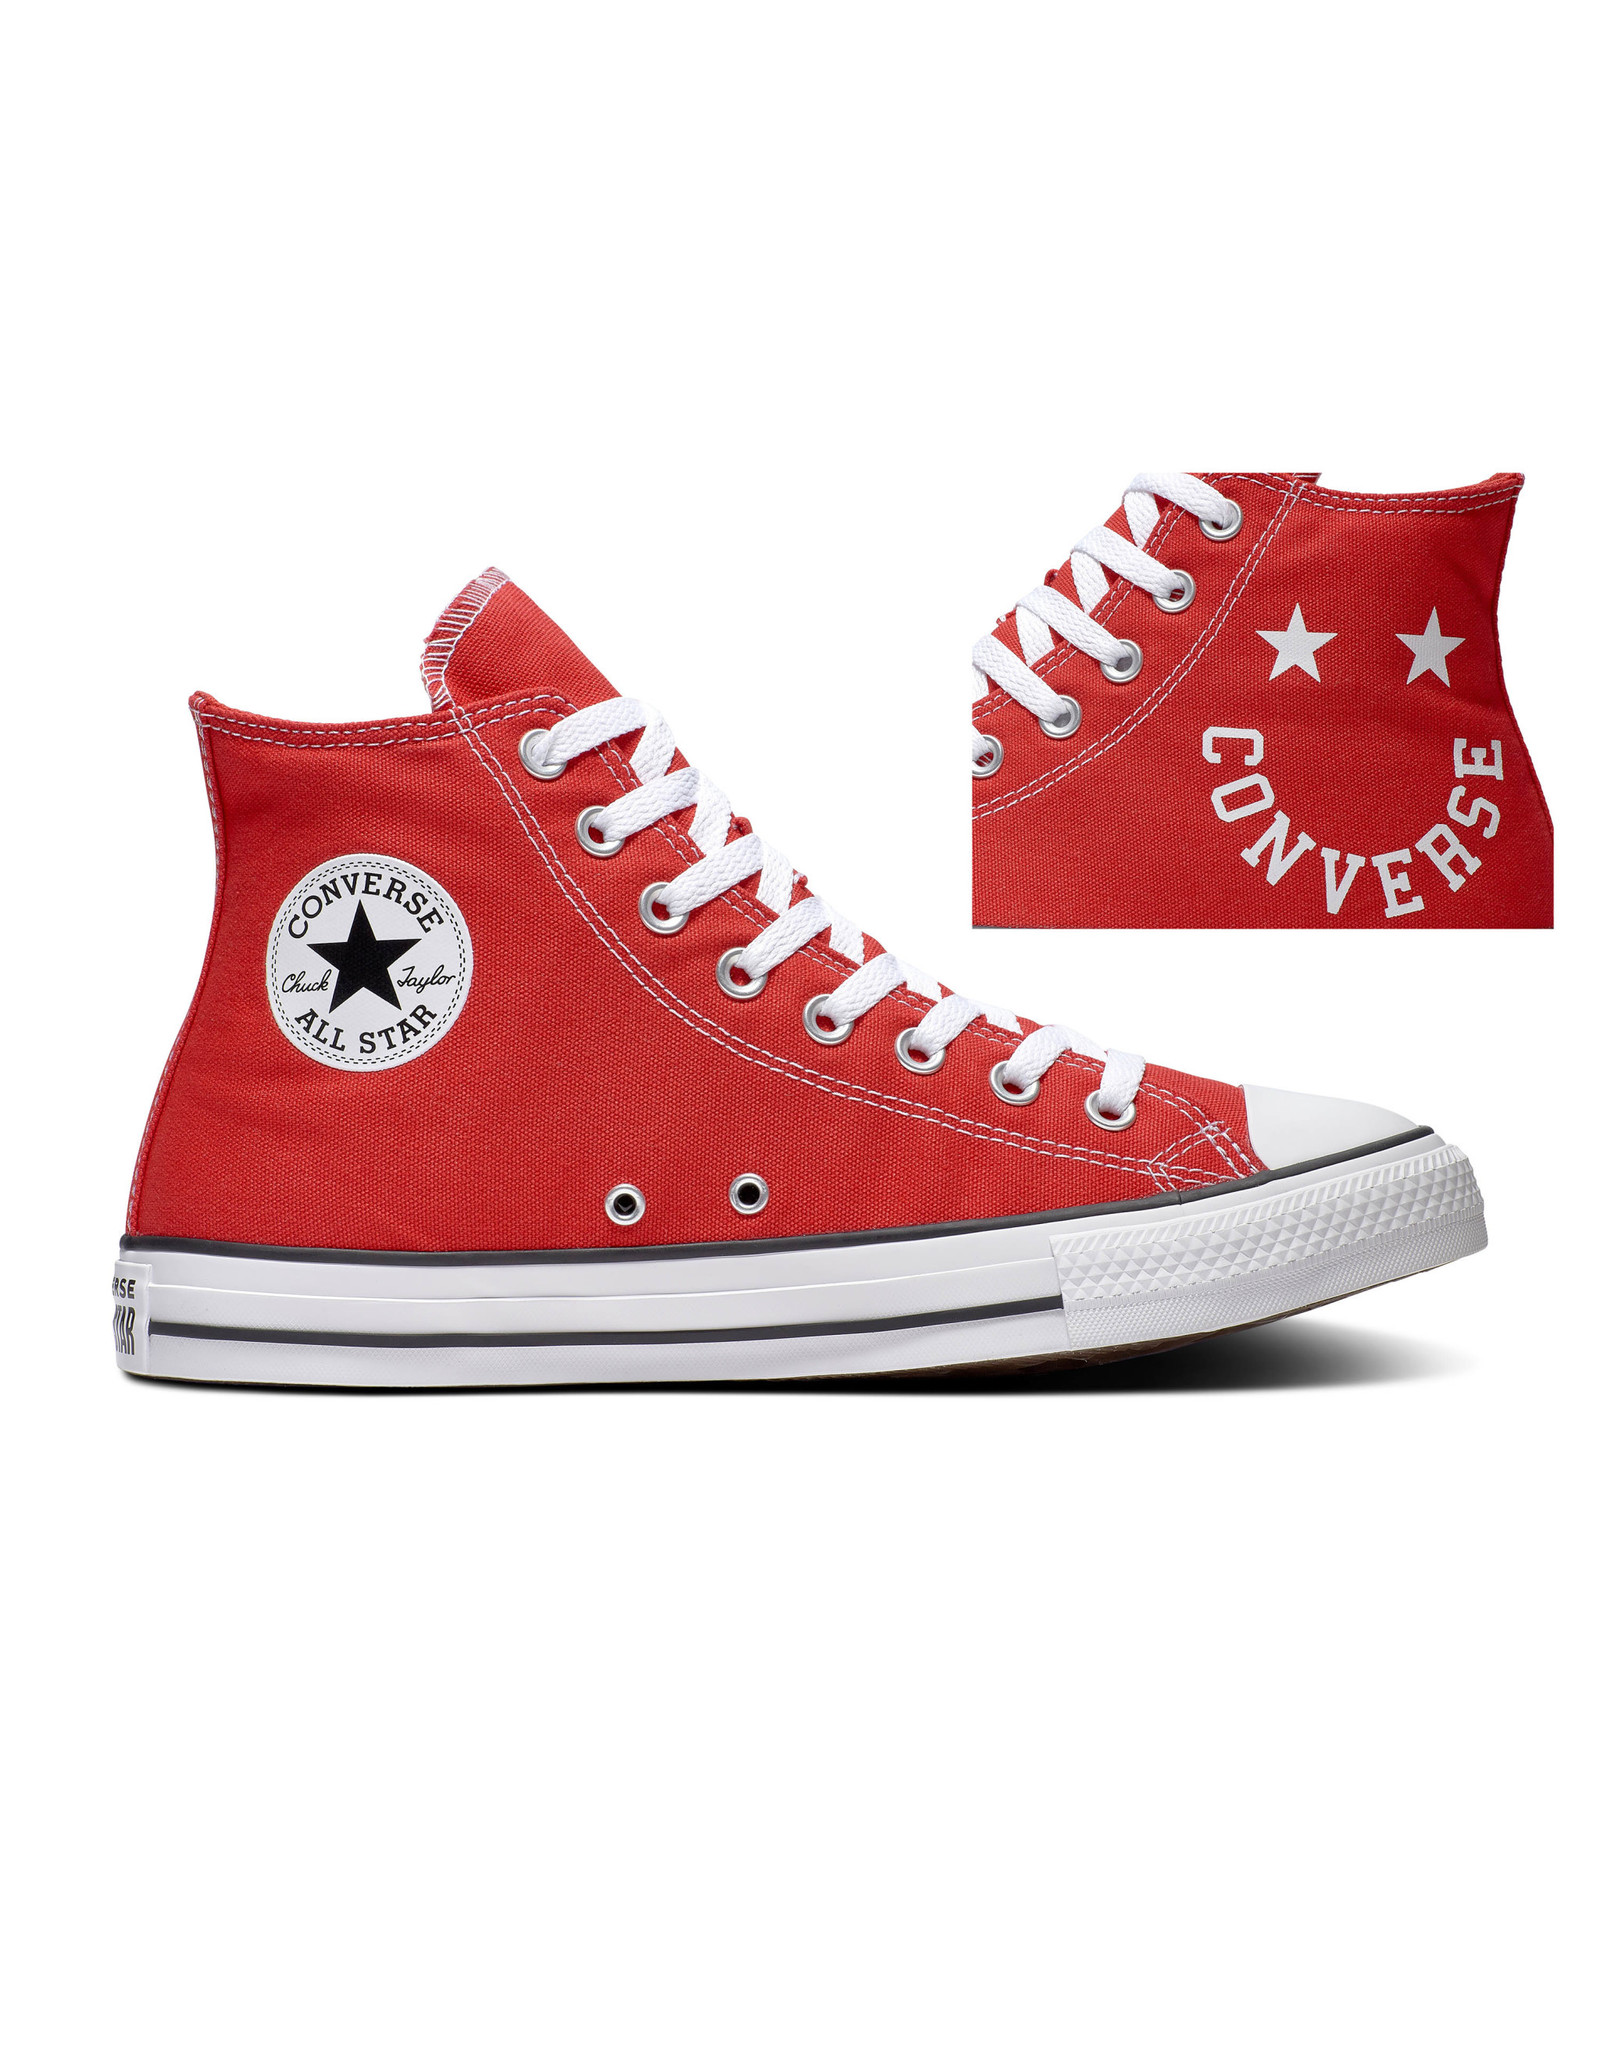 CONVERSE CHUCK TAYLOR ALL STAR  HI UNIVERSITY RED/BLACK/WHITE C20HAR-167069C